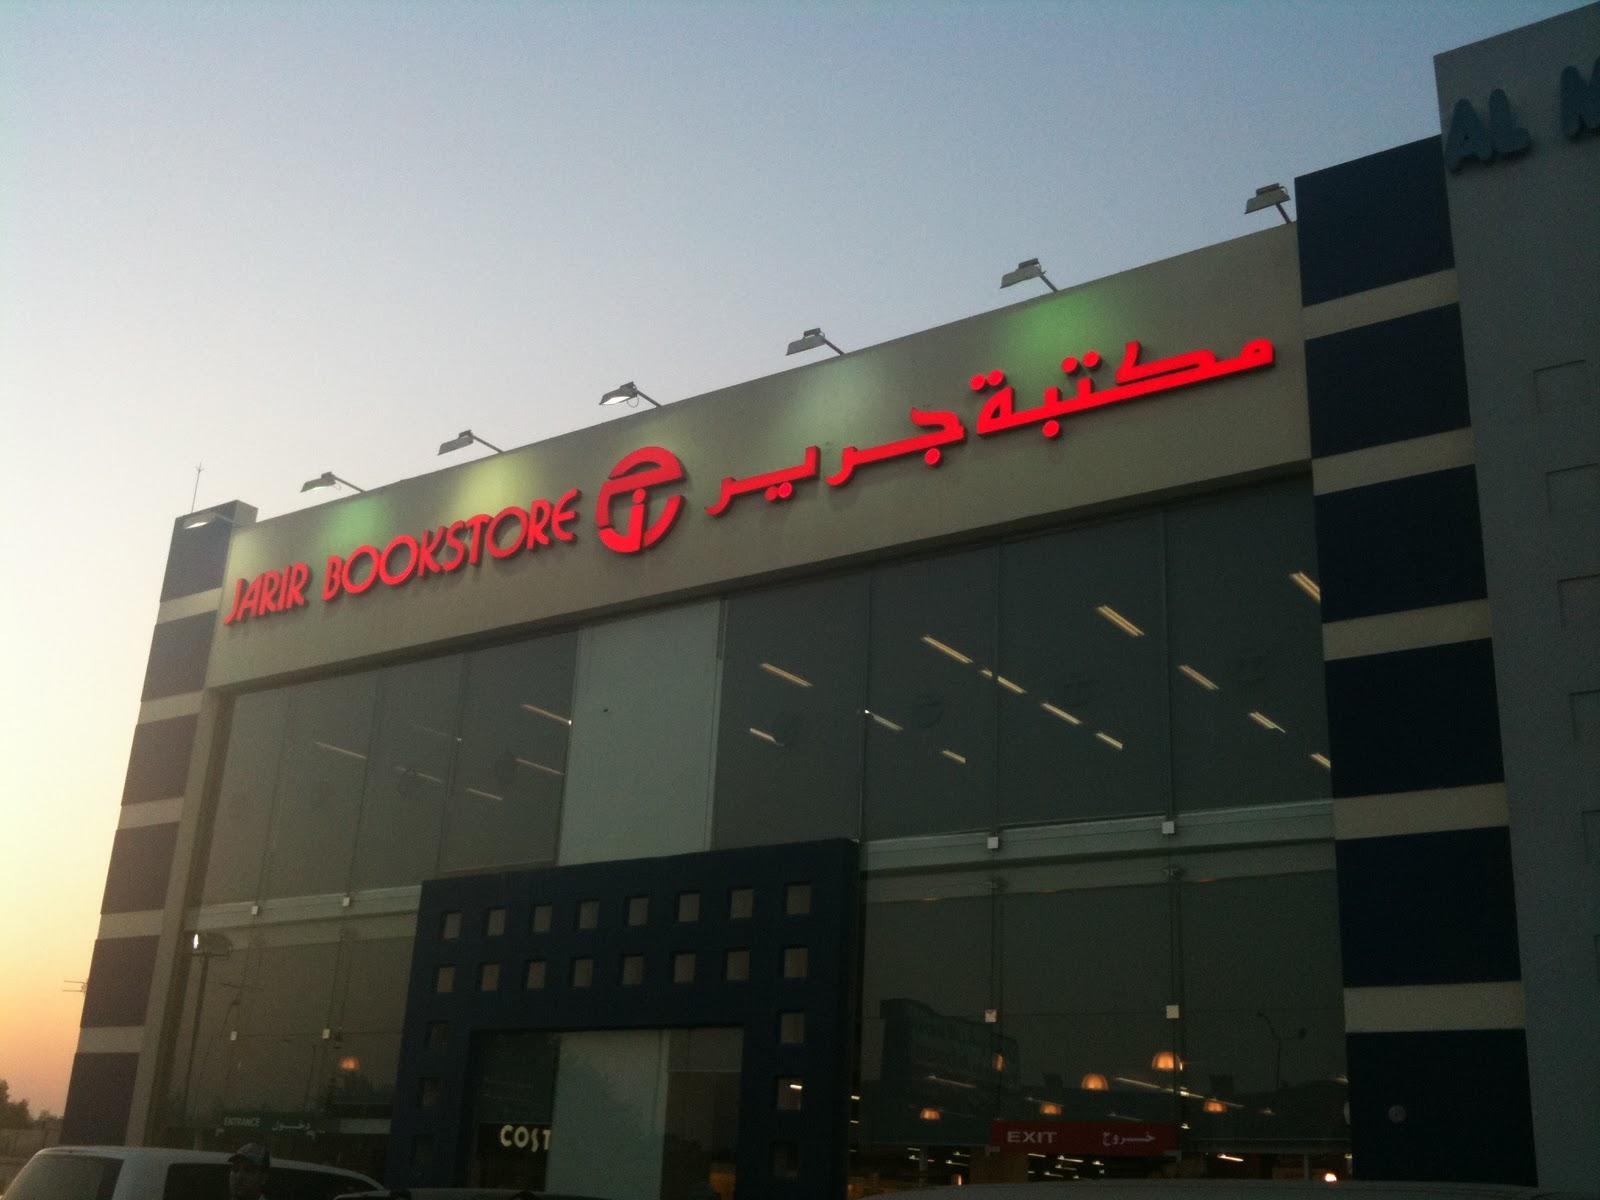 Jarir Bookstore Shop For Arabic English Books Publications Office Supplies